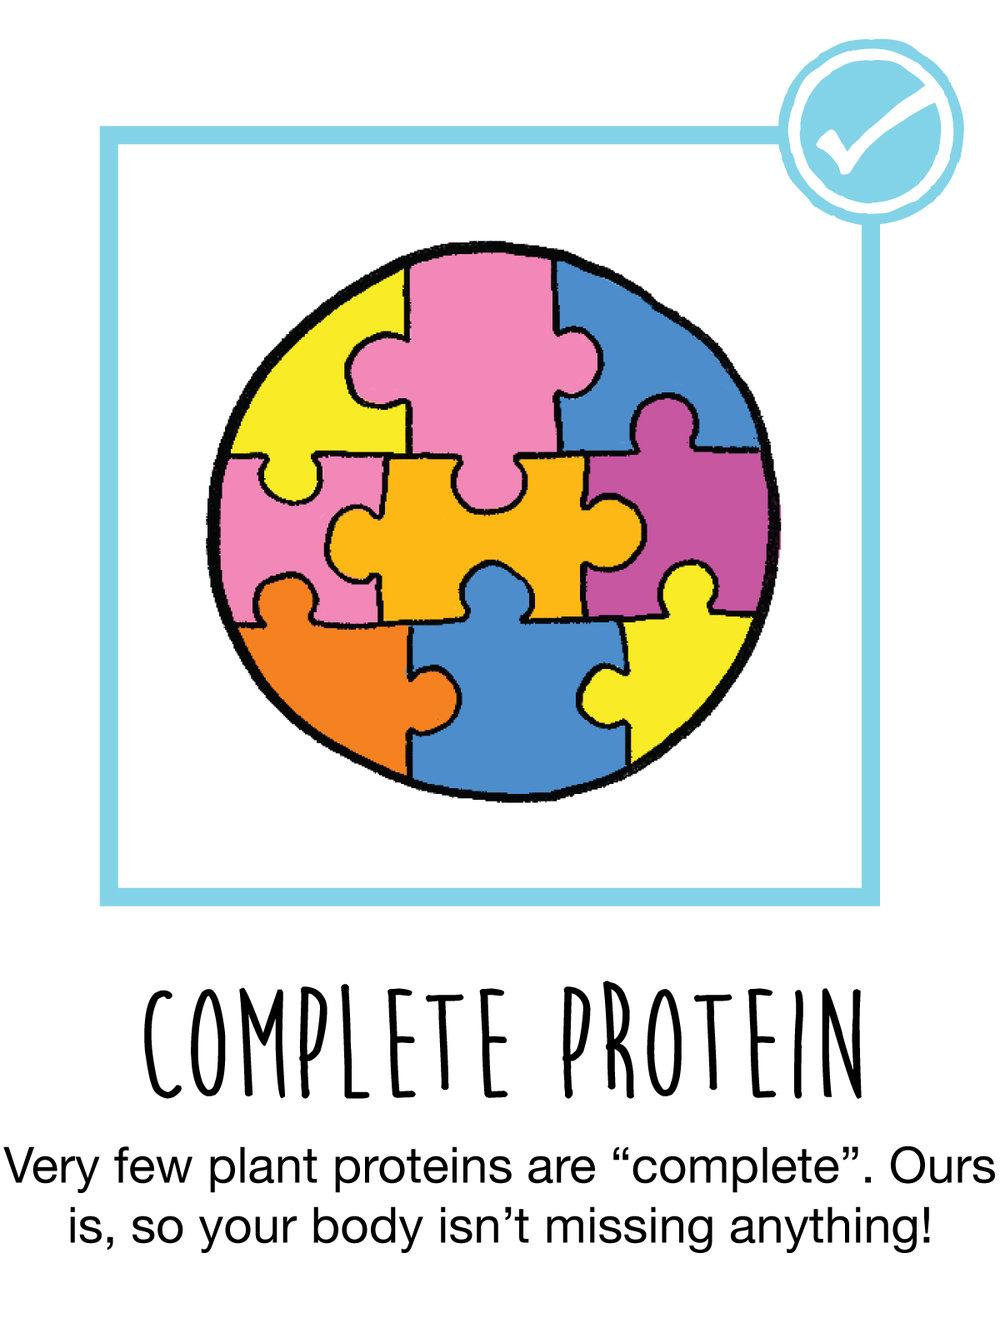 completeprotein.jpg